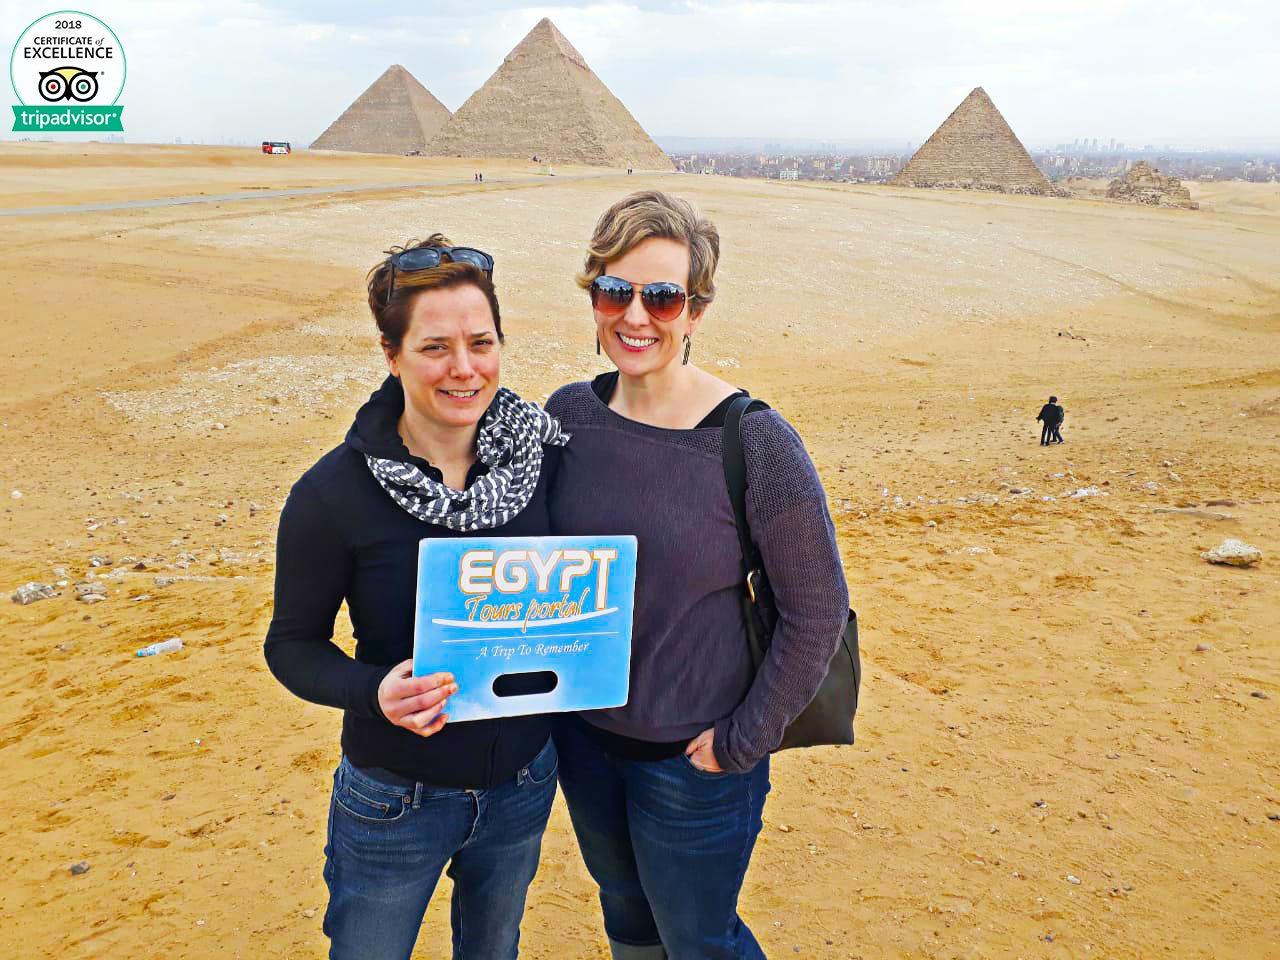 Egypt Tours - Canopic Jars - Egypt Tours Portal